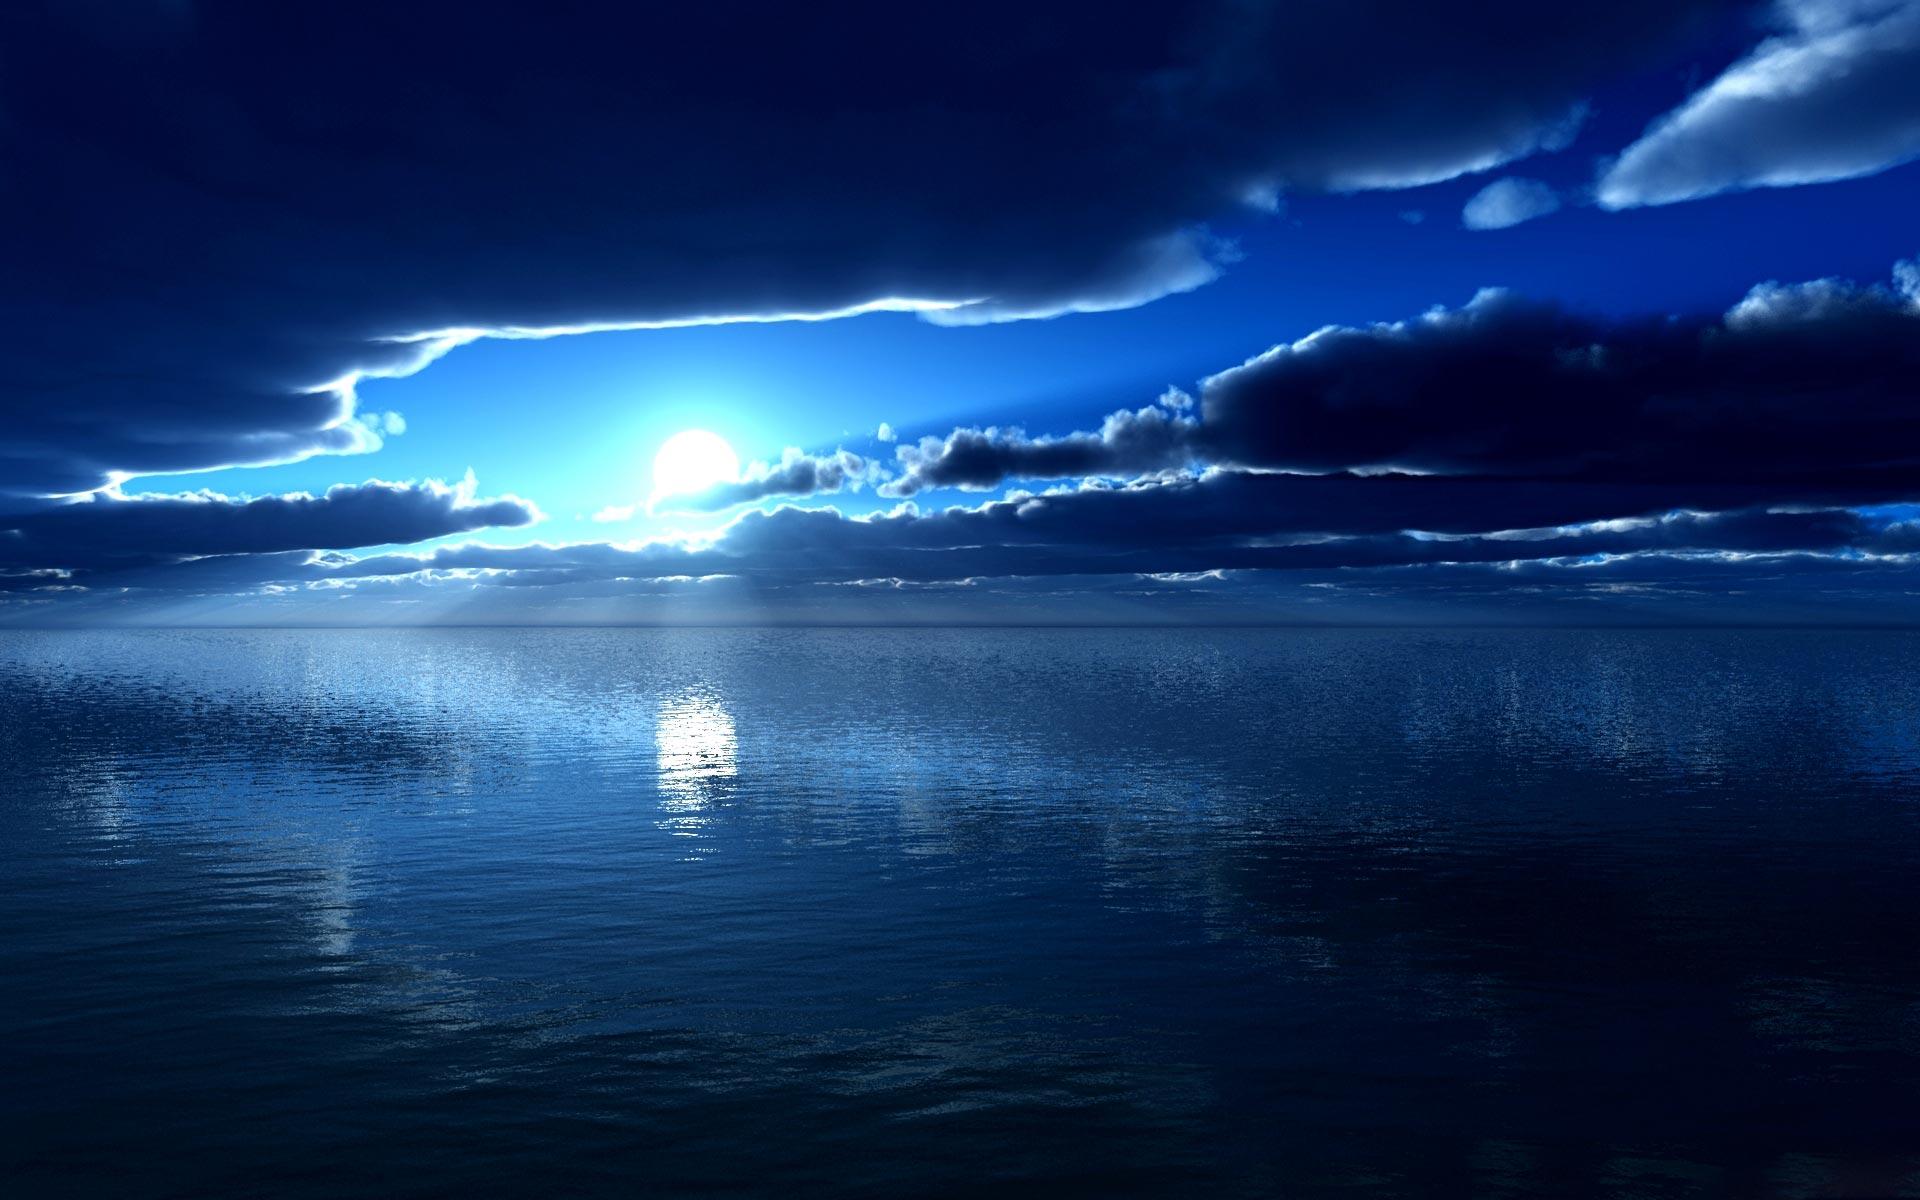 Ocean Backgrounds hd   HD Wallpapers 1920x1200